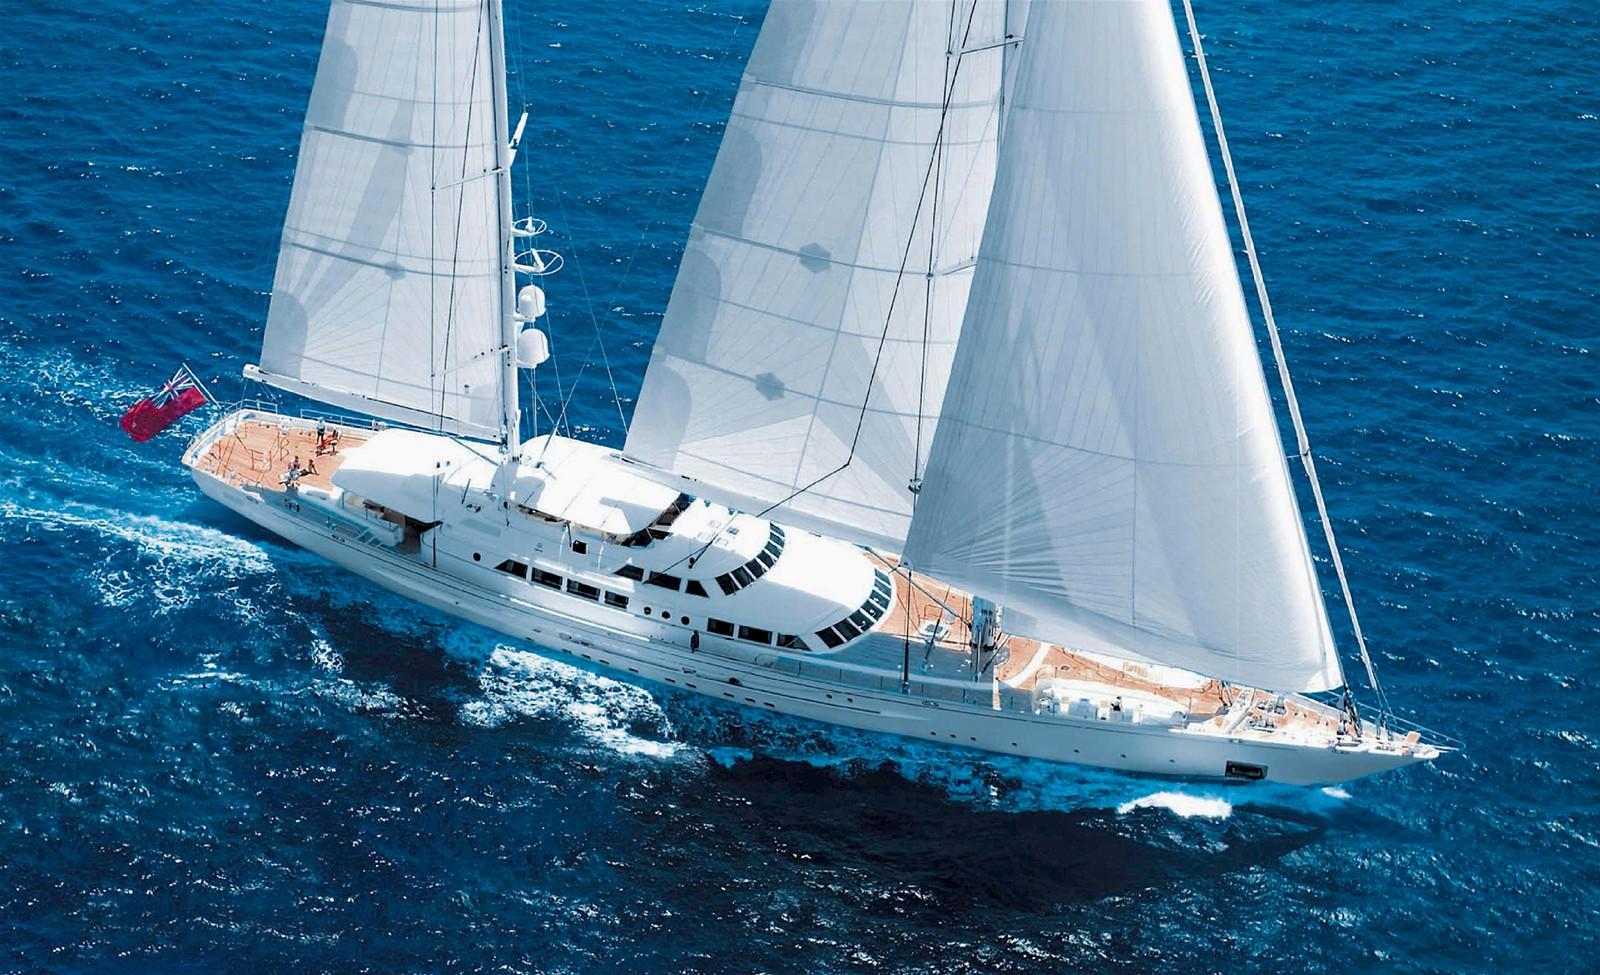 SPIRIT OF THE Cs sailing yacht